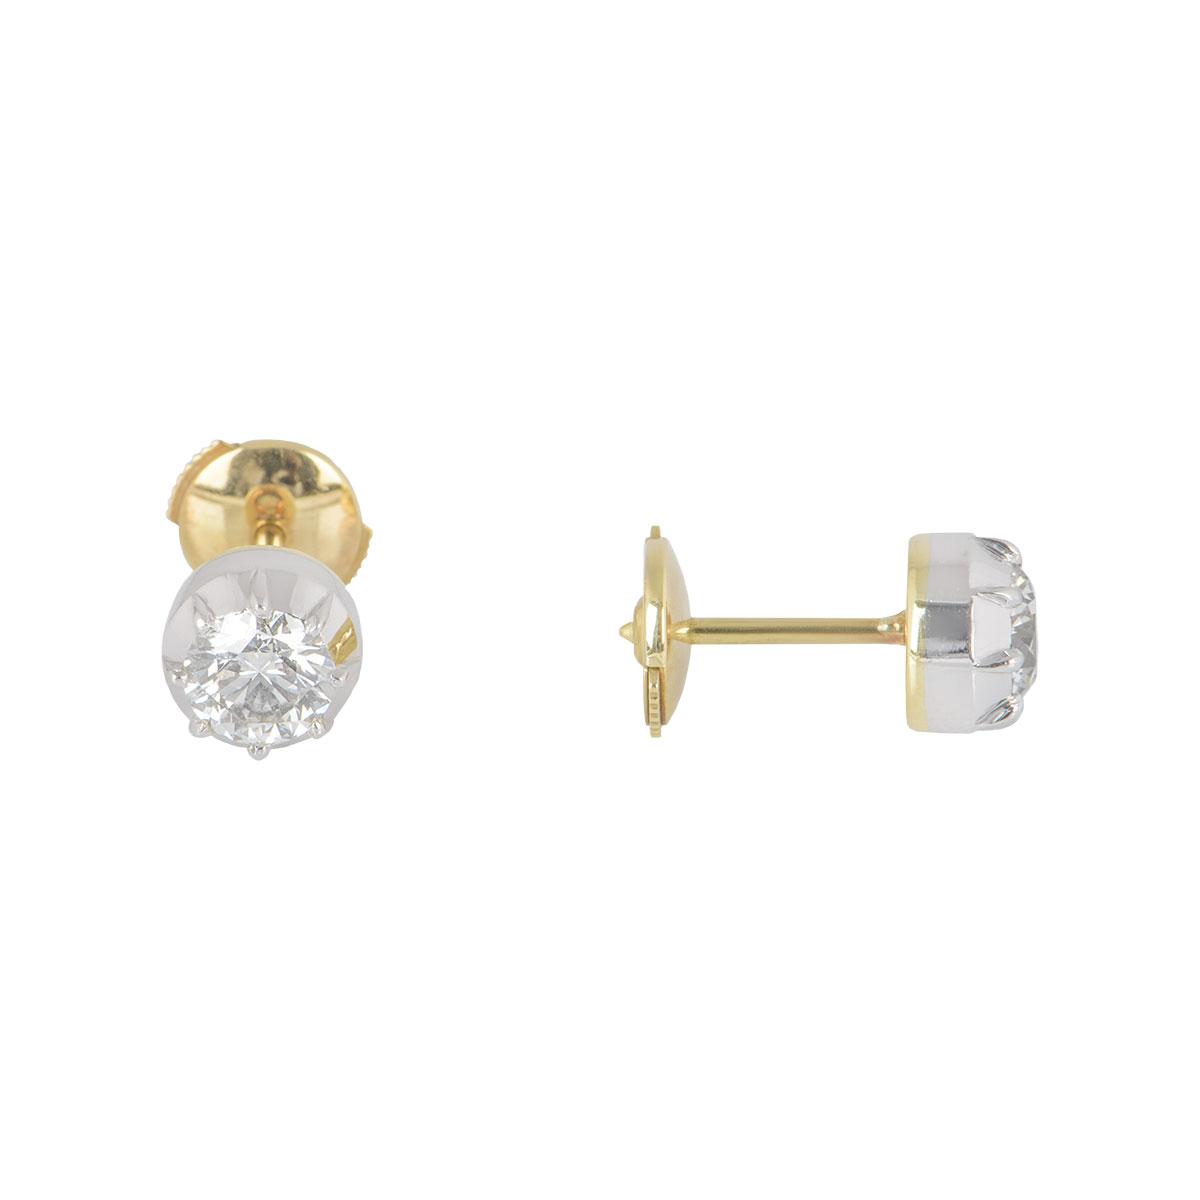 Bi-Colour Diamond Stud Earrings